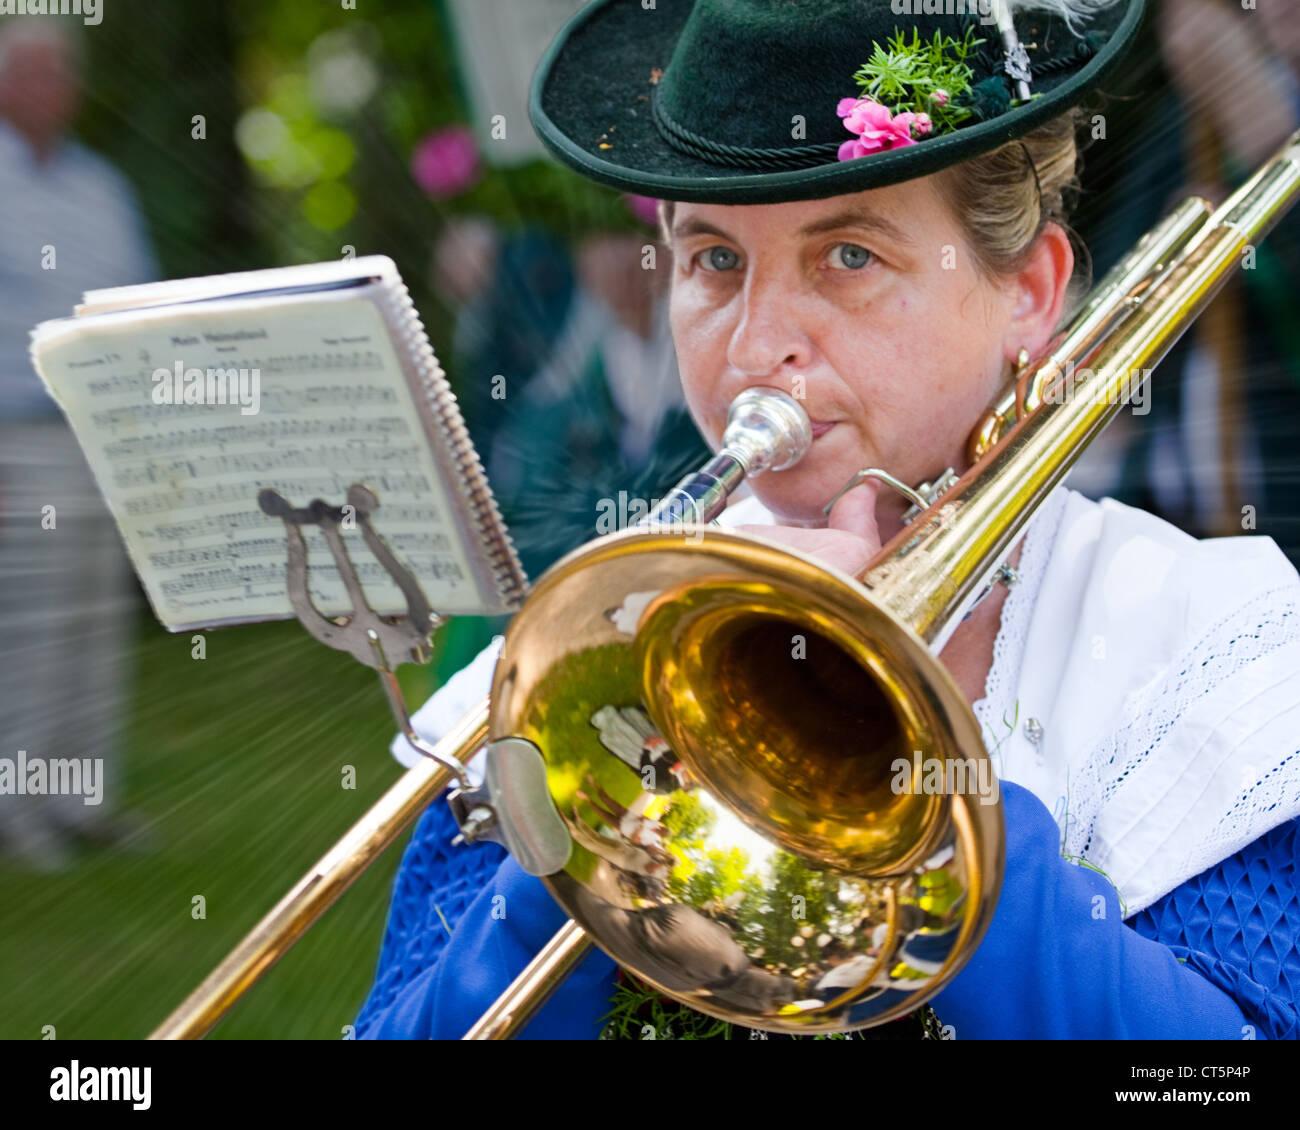 DE - Baviera: 85ª Loisachgaufest en Bad Toelz (28 de junio al 02 de julio de 2012). Foto de stock